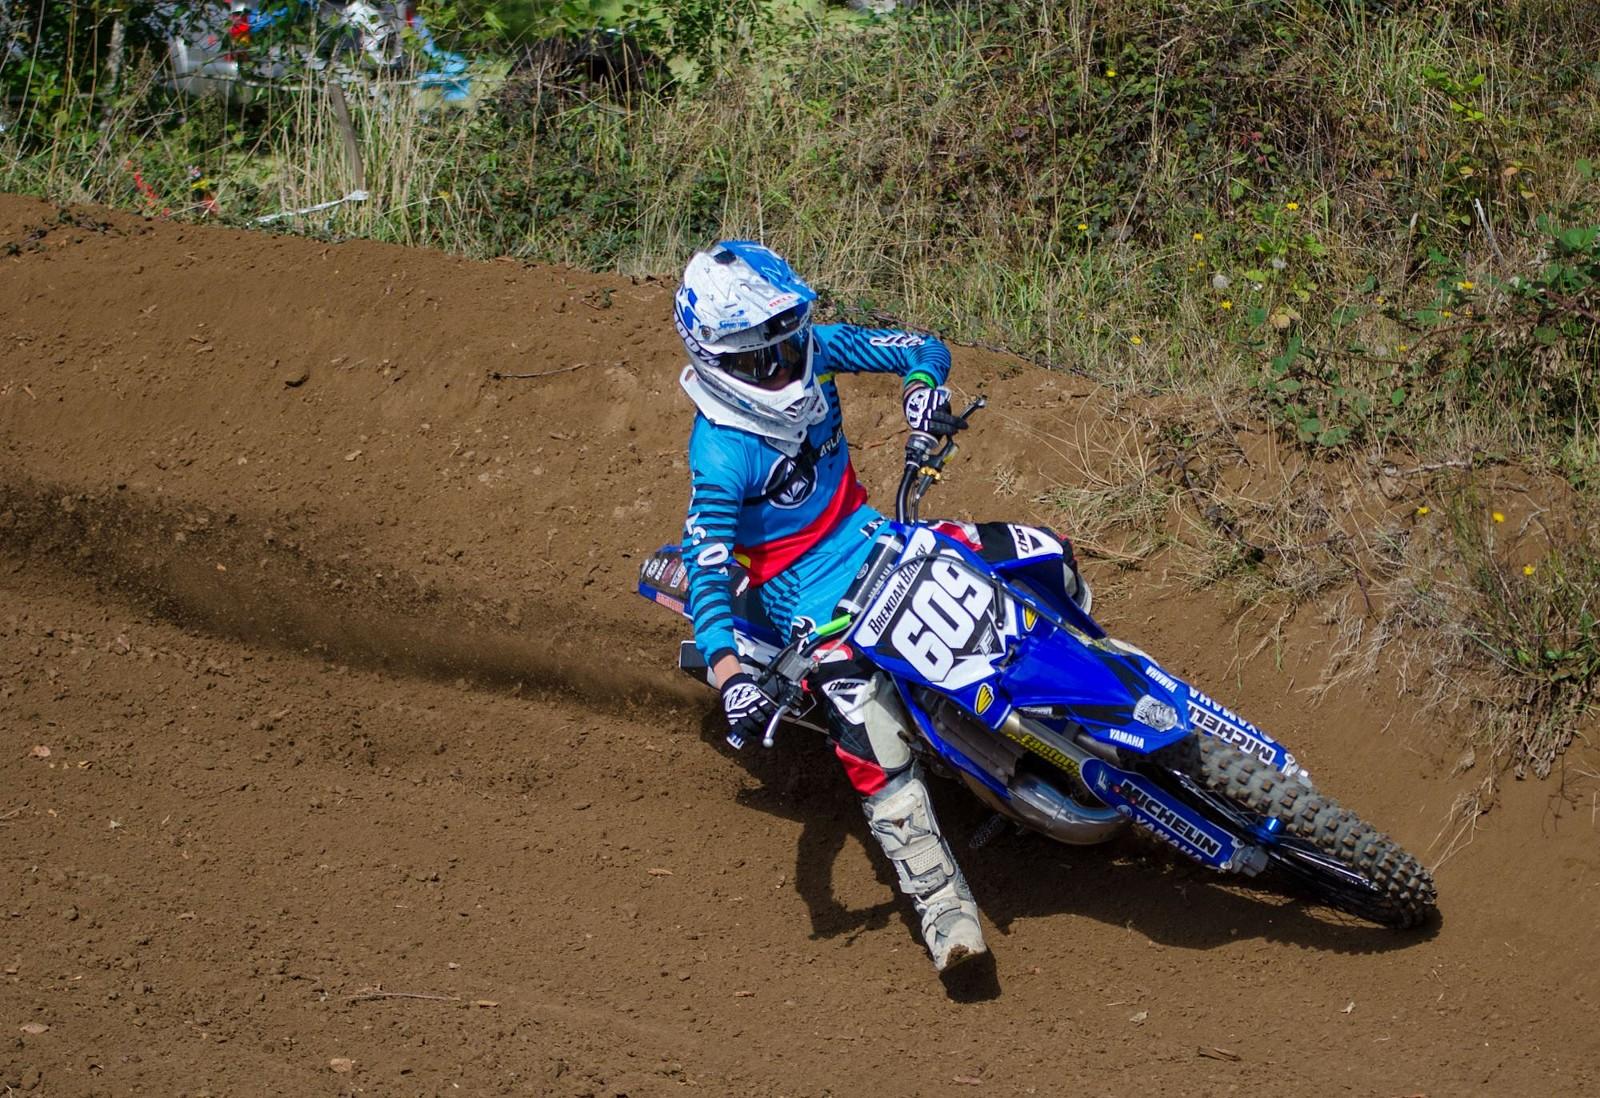 14324266 1773084889634266 8631270319147956019 o - mxaaron - Motocross Pictures - Vital MX